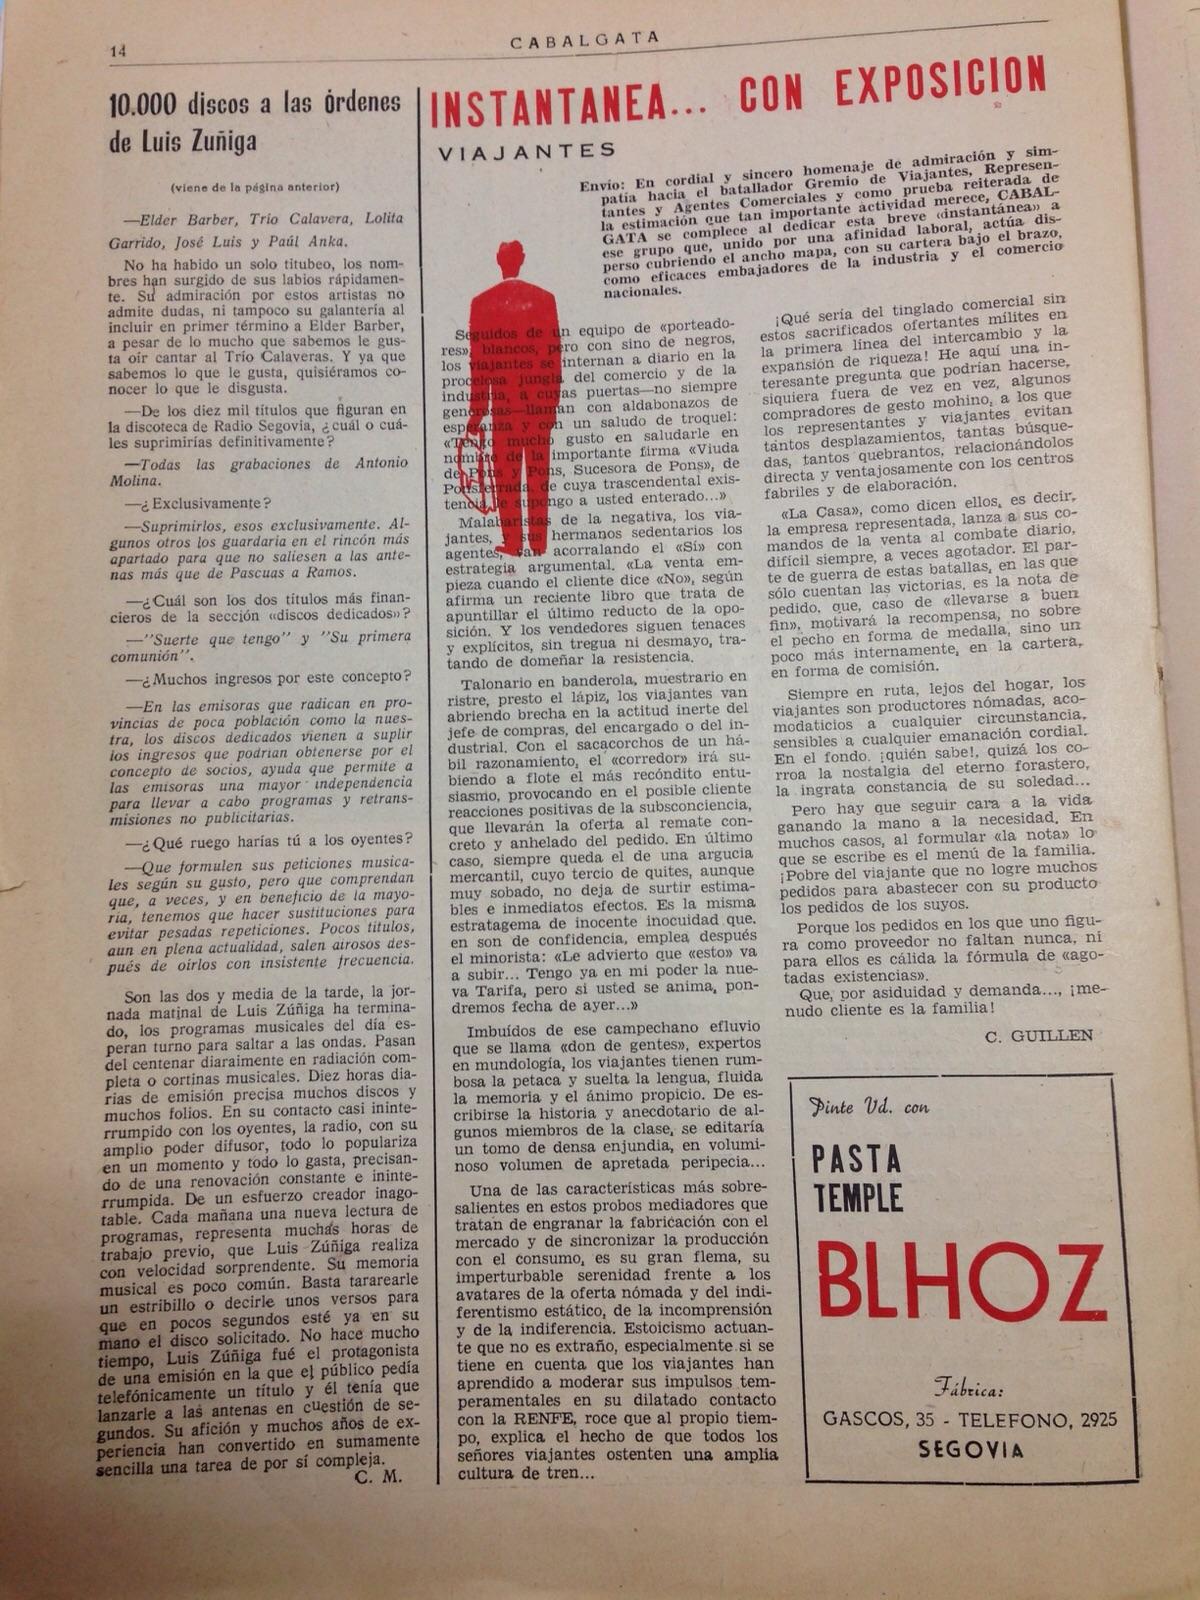 161001-luiz-zuniga-reportaje-cabalgata-anos-50_2